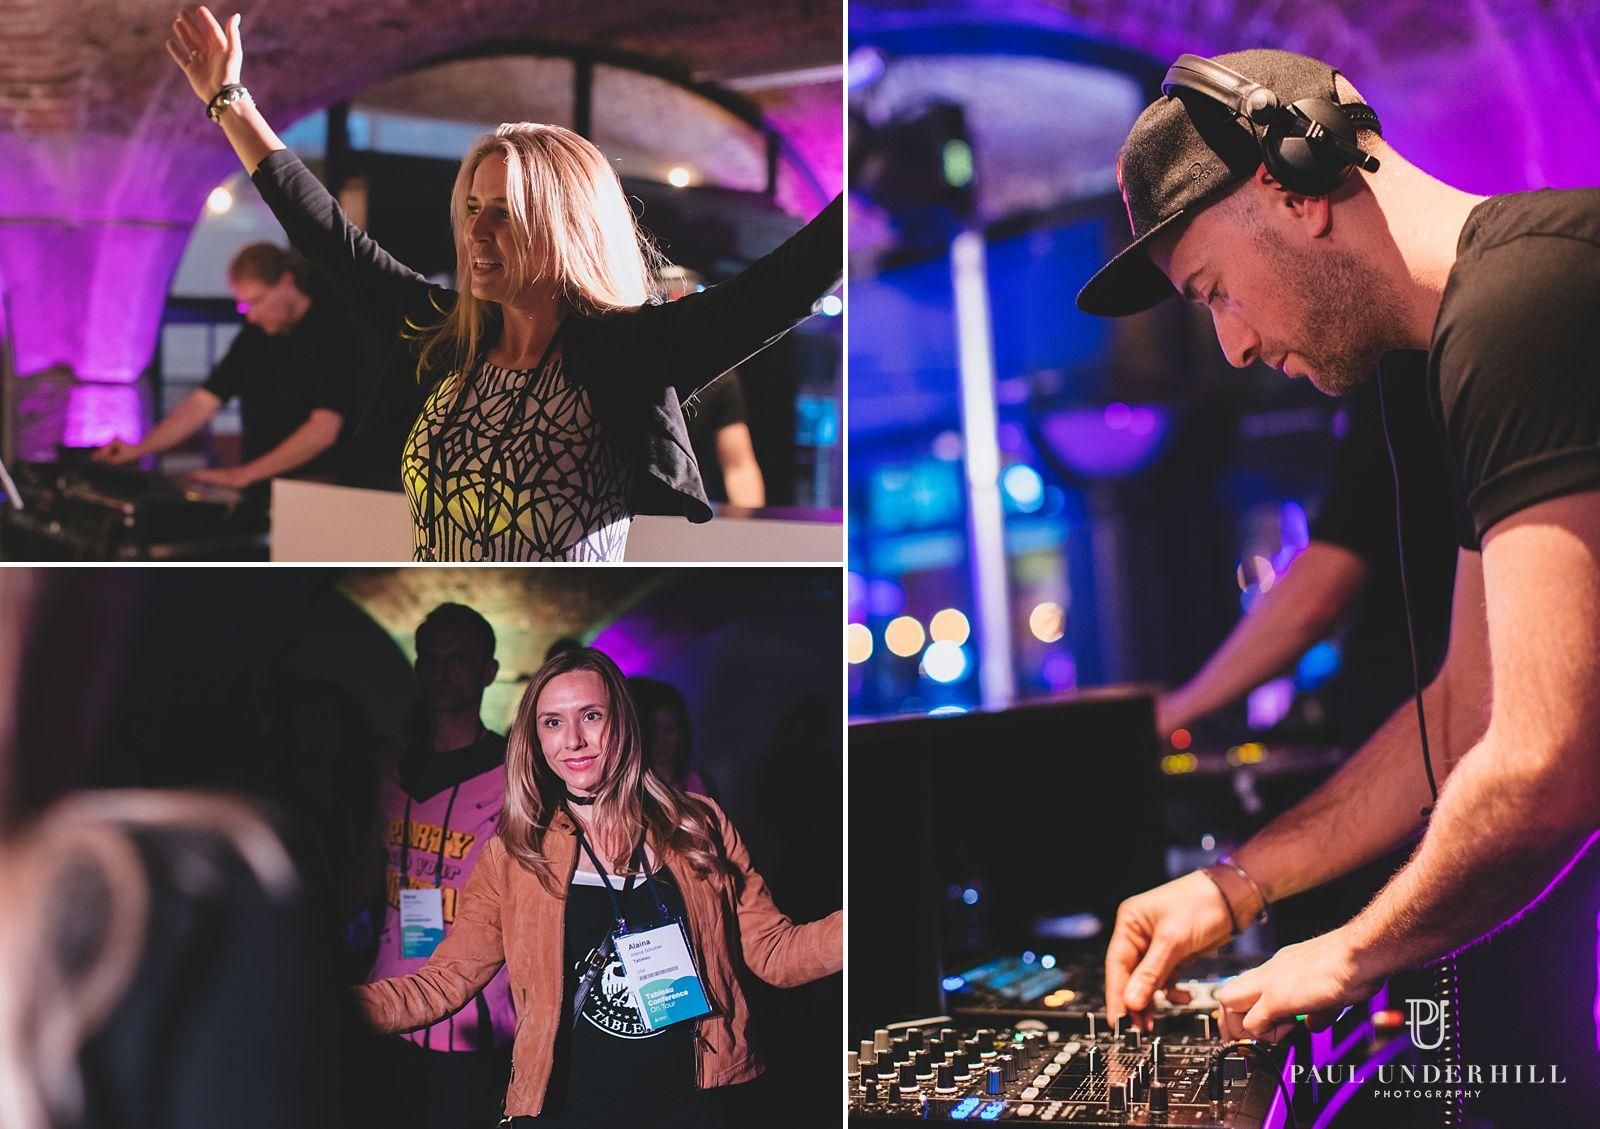 DJ Tabacco Dock London event